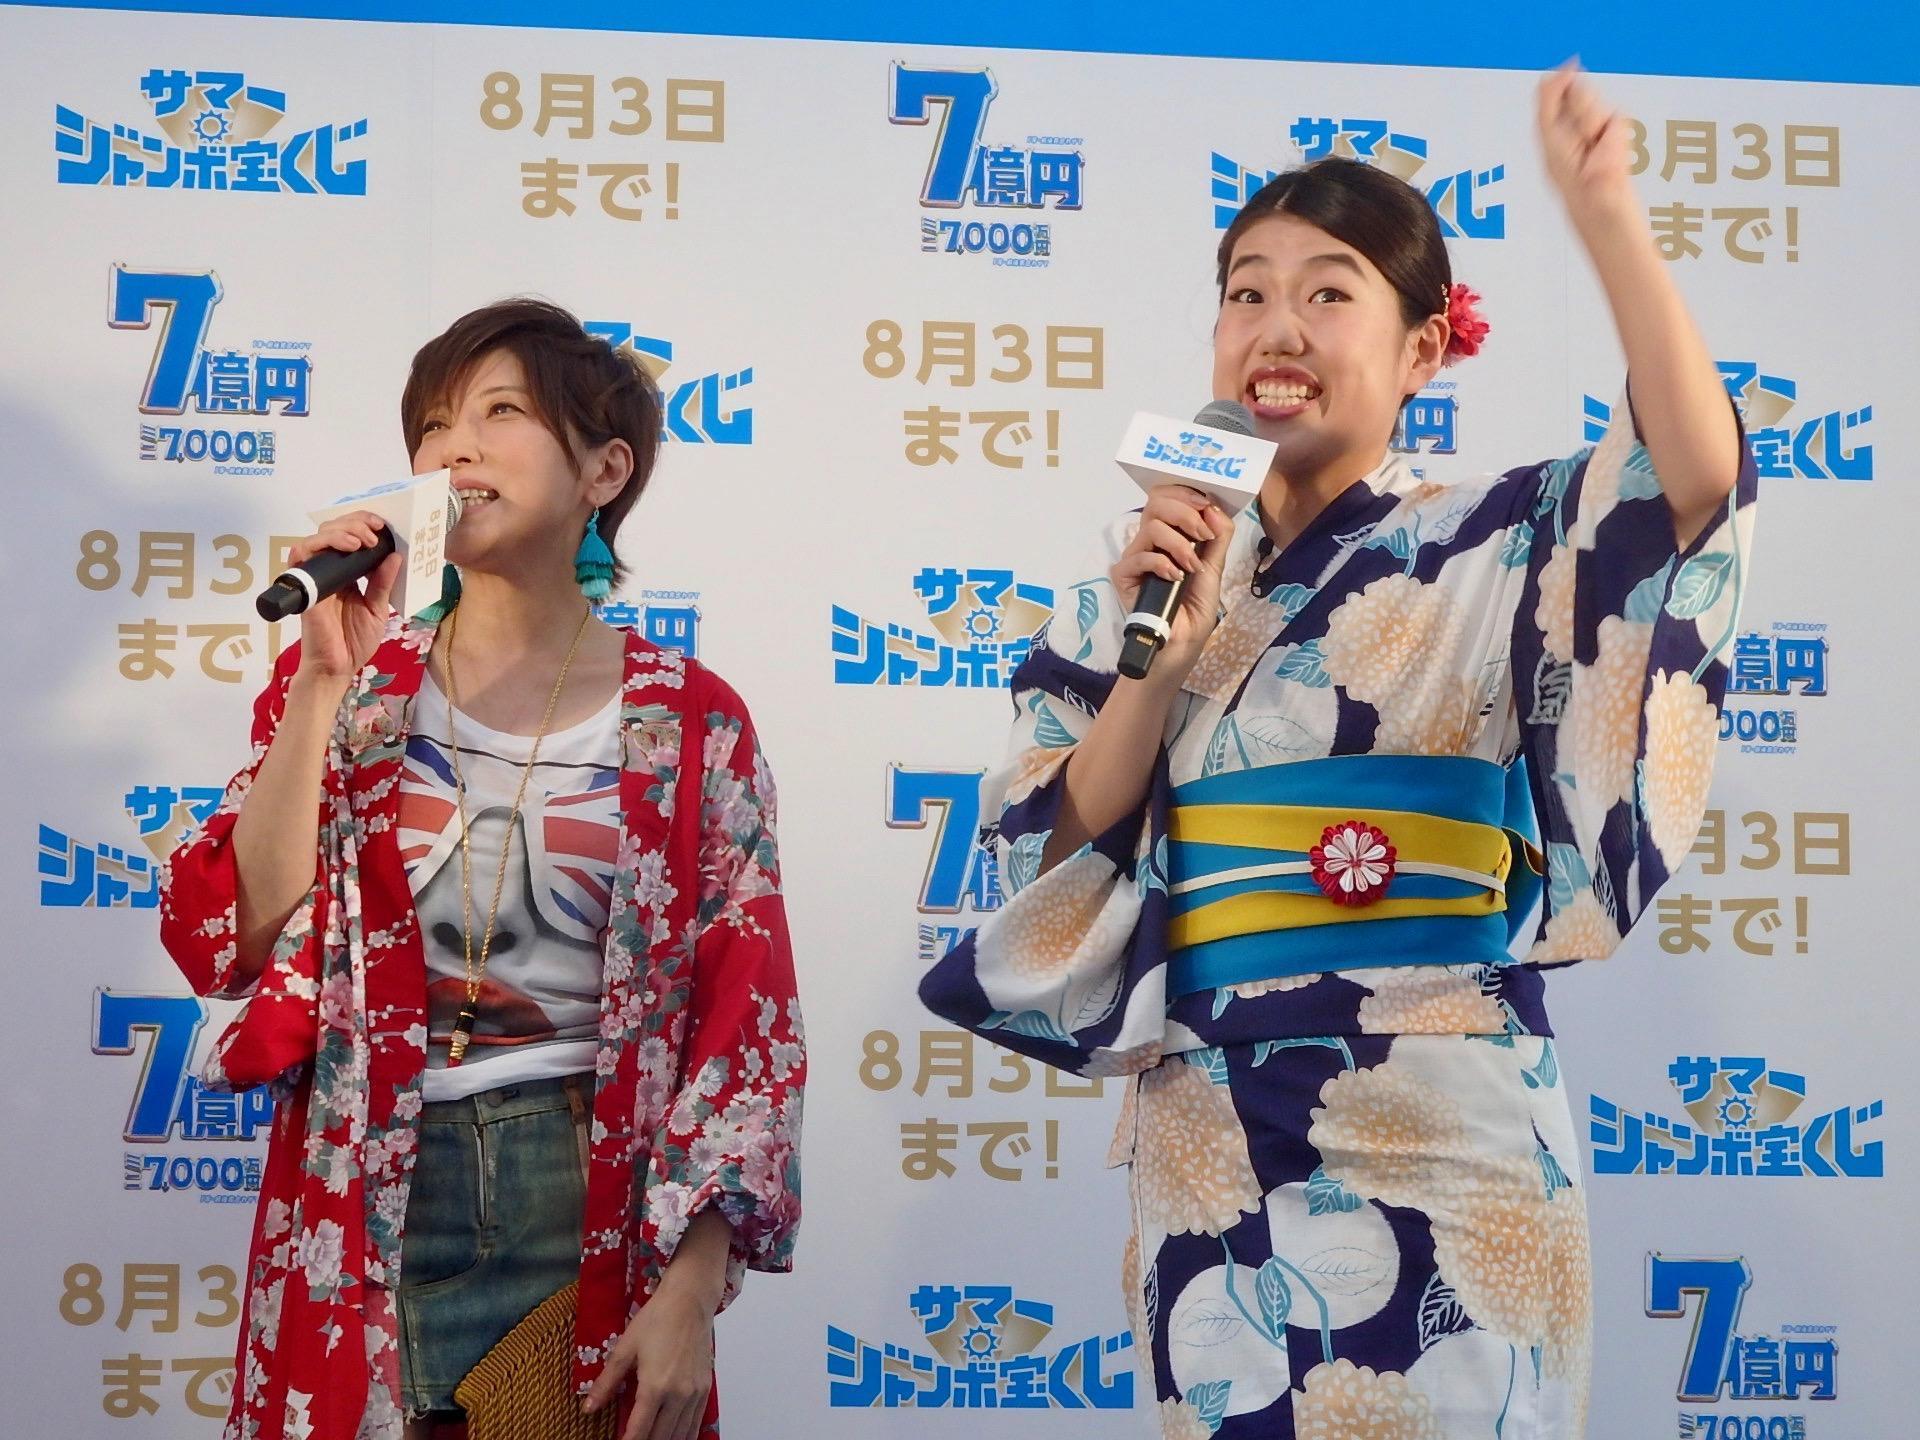 http://news.yoshimoto.co.jp/20180709203244-becbed6a9a726b903afe287e72dbe099f762a2f7.jpg